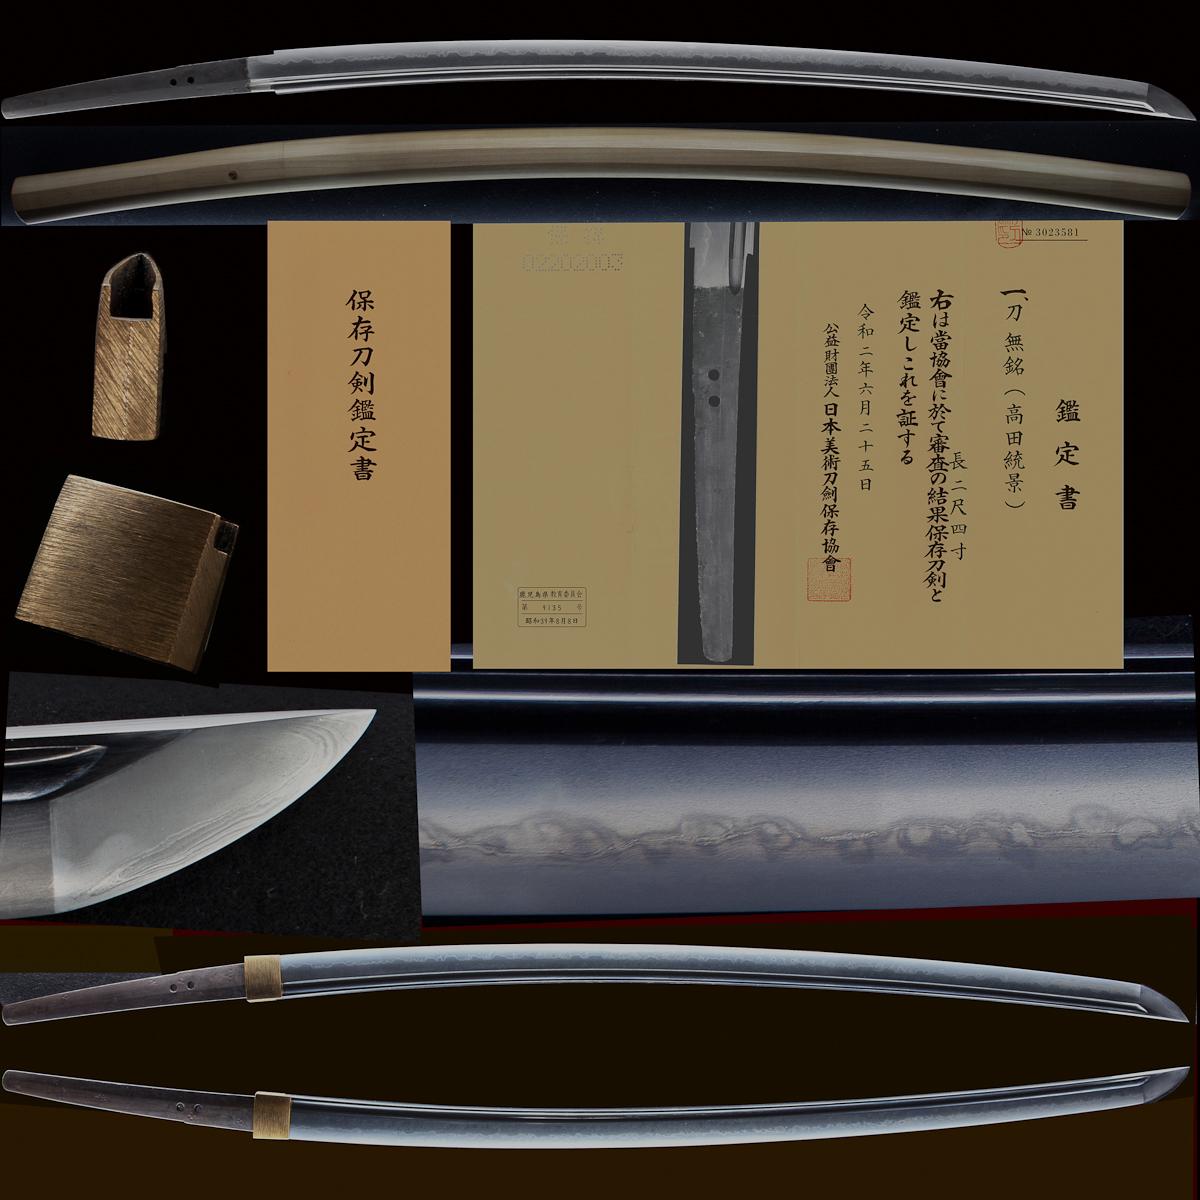 Ōtomo Yoshimune (大友義統, 1558 – 1610) Takada Munekage Ōtomo Yoshimune was a Japanese daimyō of the Sengoku period, heir of Otomo Sōrin at the head of the Ōtomo clan. He was the eldest son Munekage Takada(Tokei Takada), a swordsmith who served Yoshimune Otomo 稀少!戦国大名「大友義統(第22代当主)」に仕えた刀工「高田統影」豊後高田最上作! 大友義統(藩主の佩刀か!)うぶ雉股茎「太刀(一文字写し)「高田統影」の最高傑作!天下無双ノ一振り。 丁子乱れ・乱映り有。切先43.7mm 身幅34.7mm 重量(裸刀身)885gで豪壮刀。 研減りもなく妖刀如く美しく当時の姿をそのまま残す奇跡一振り。